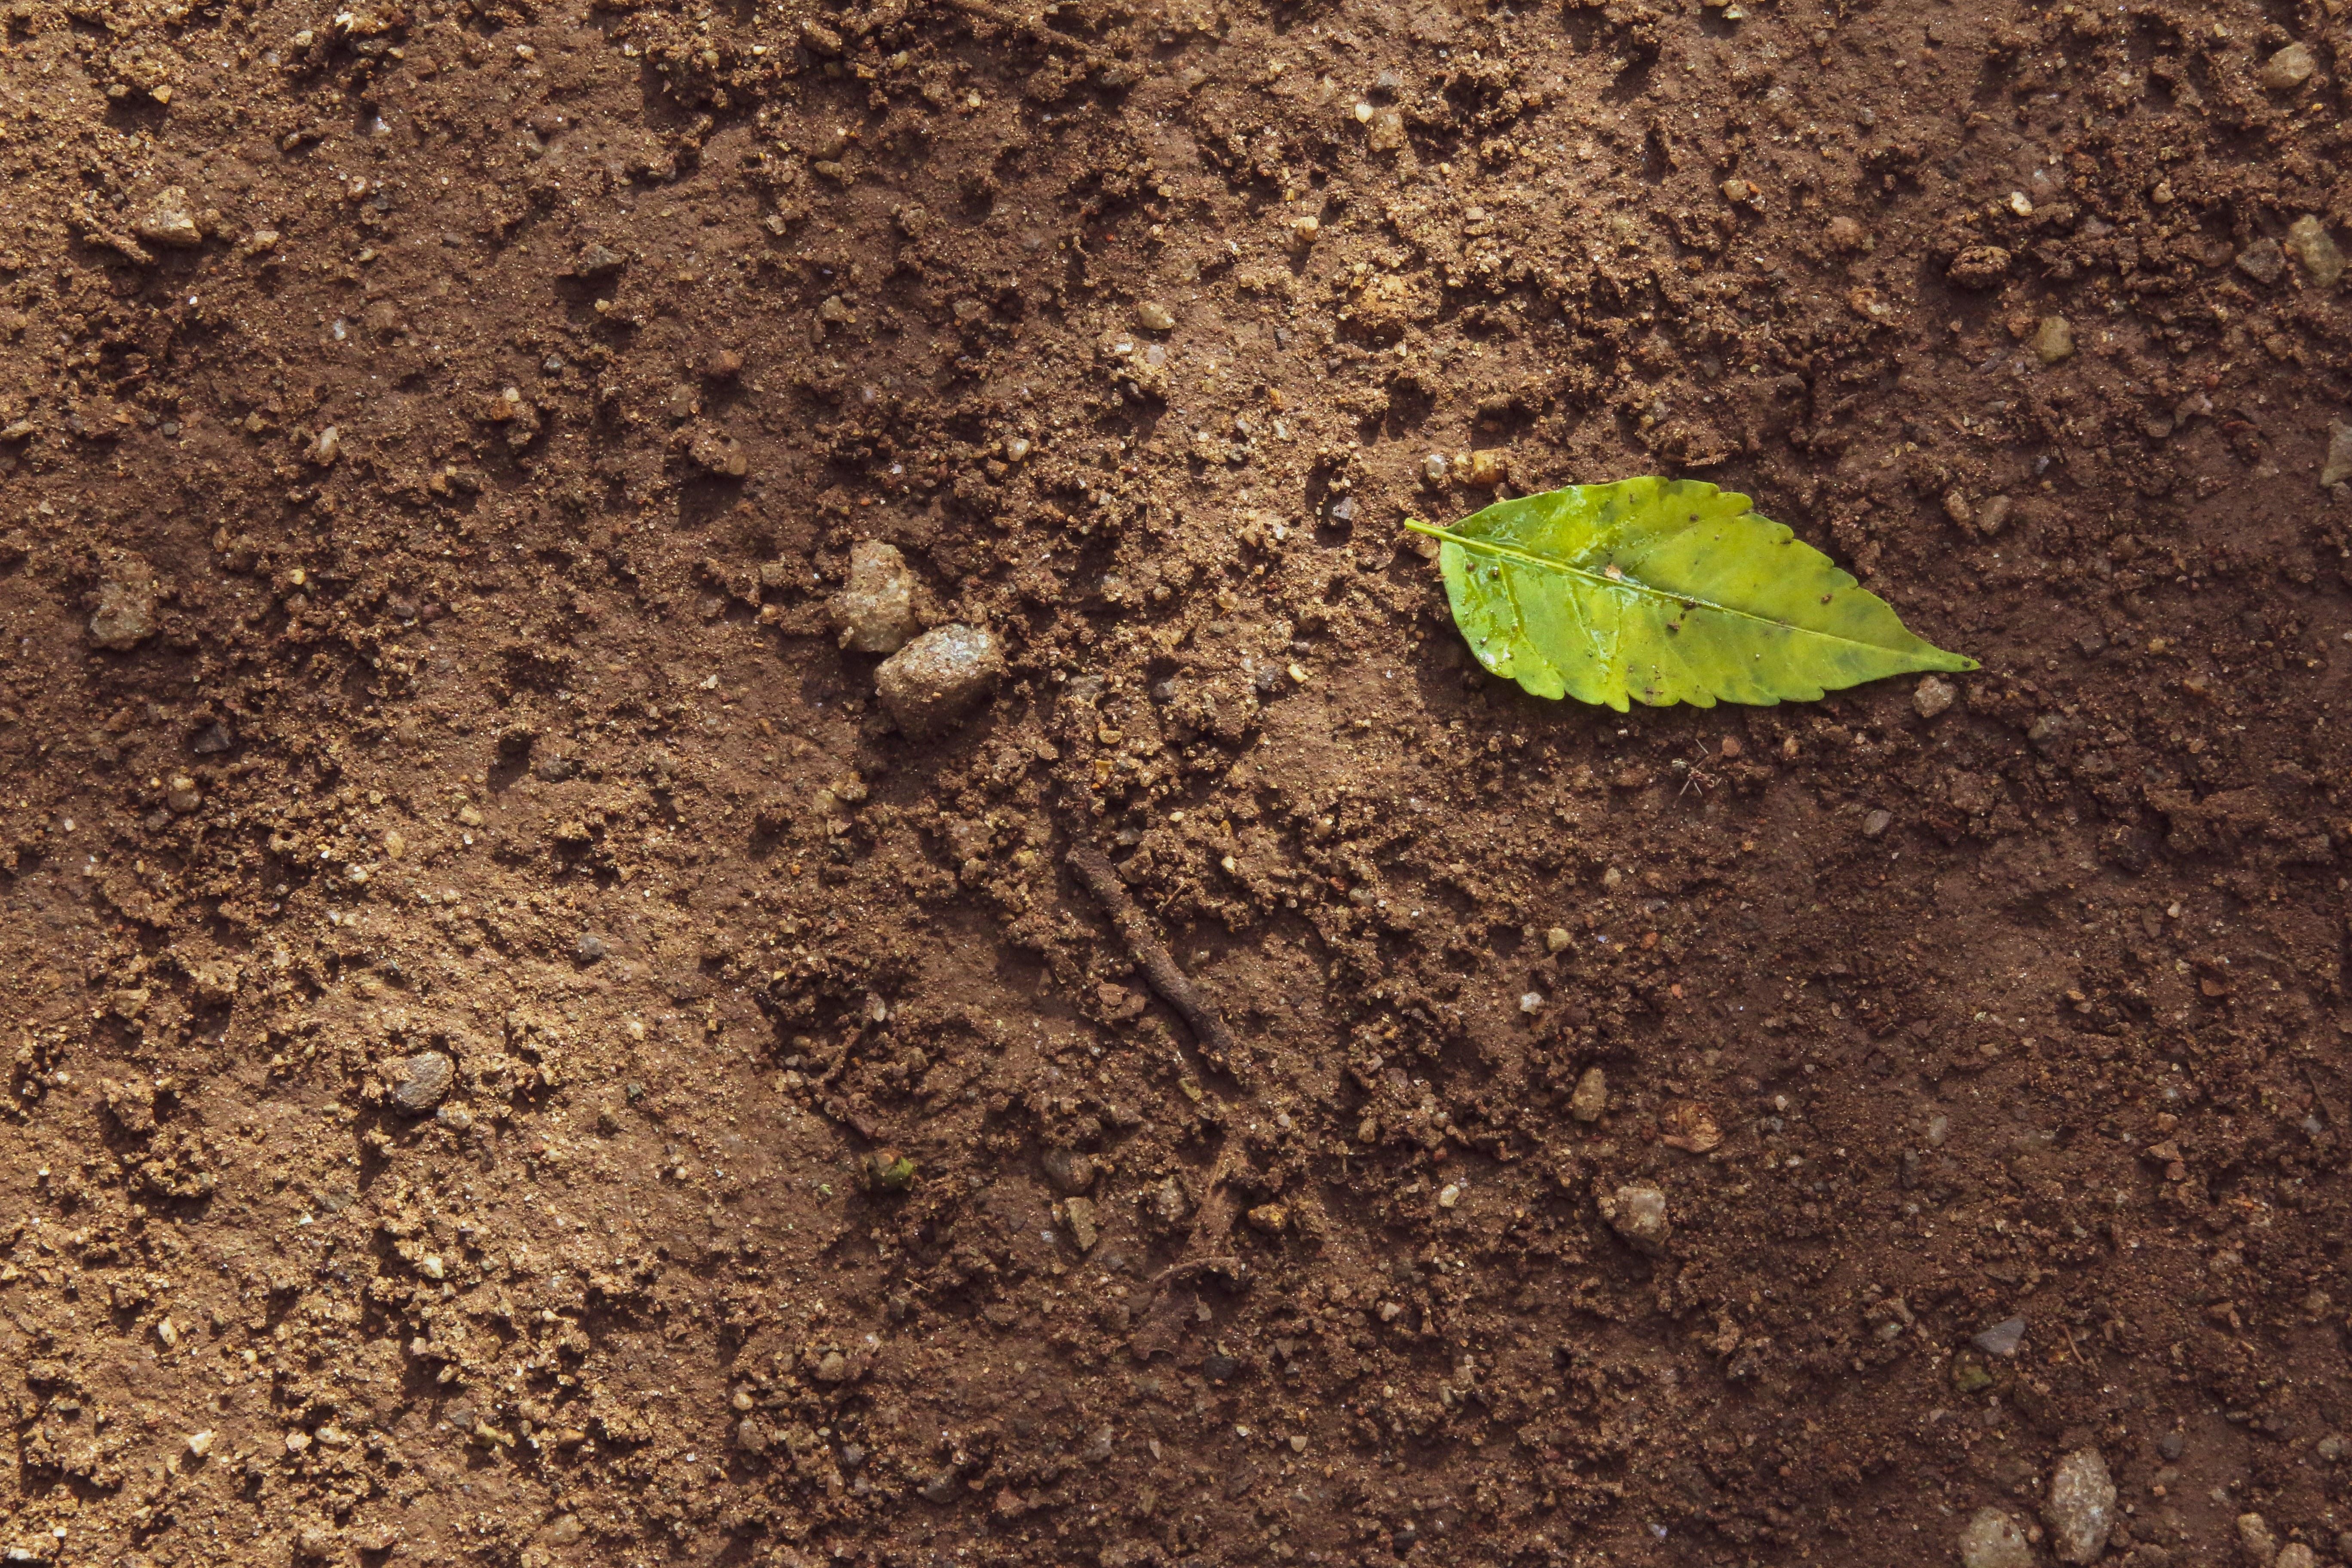 Soil2 6 16 2021 Glen Carrie I B1 Ju Jy Qob4 Unsplash